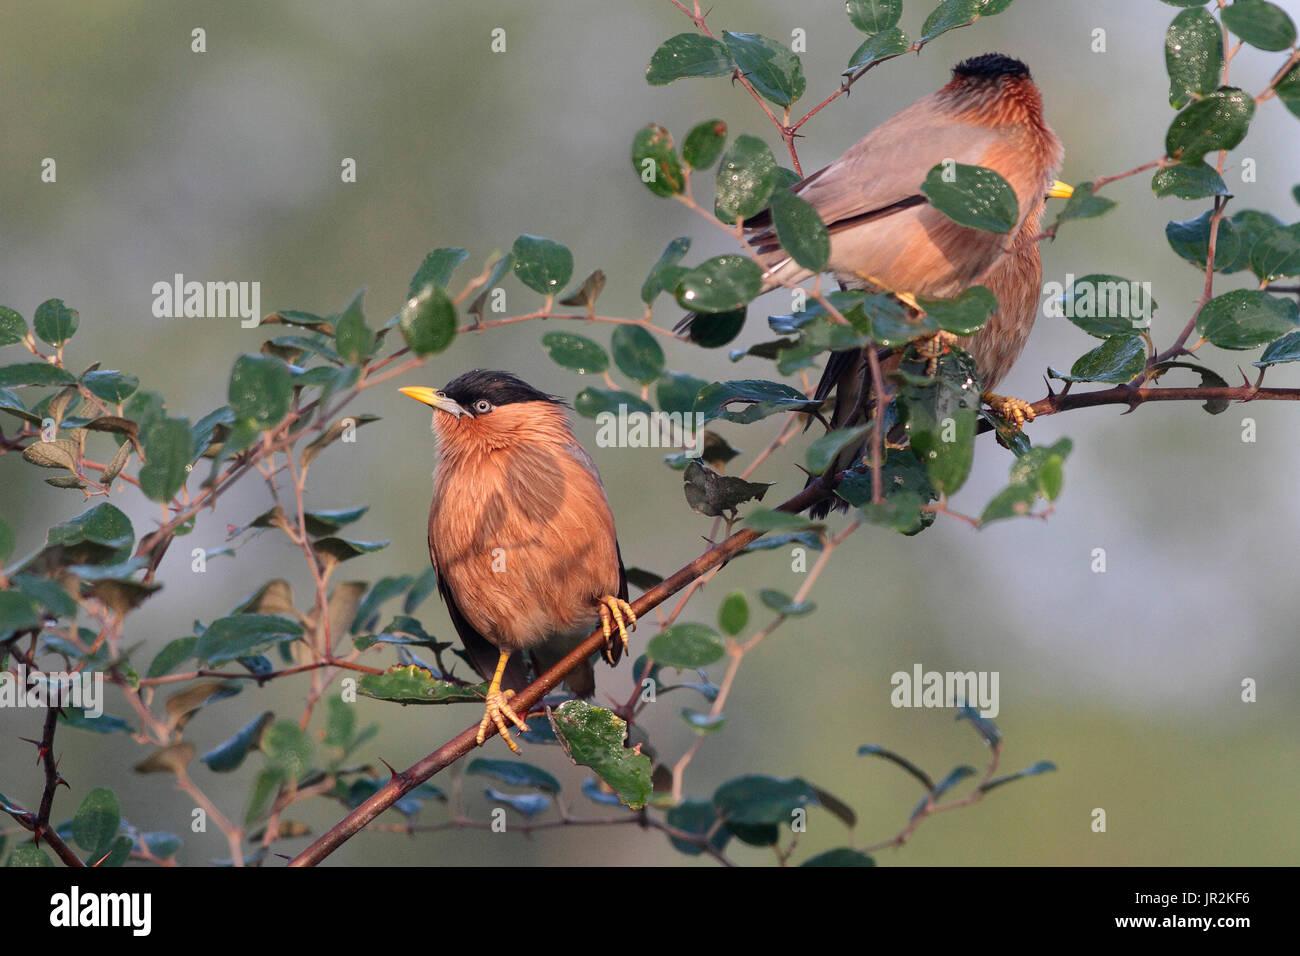 Brahminy Starlings (Sturnia pagodarum) on a branch, India - Stock Image